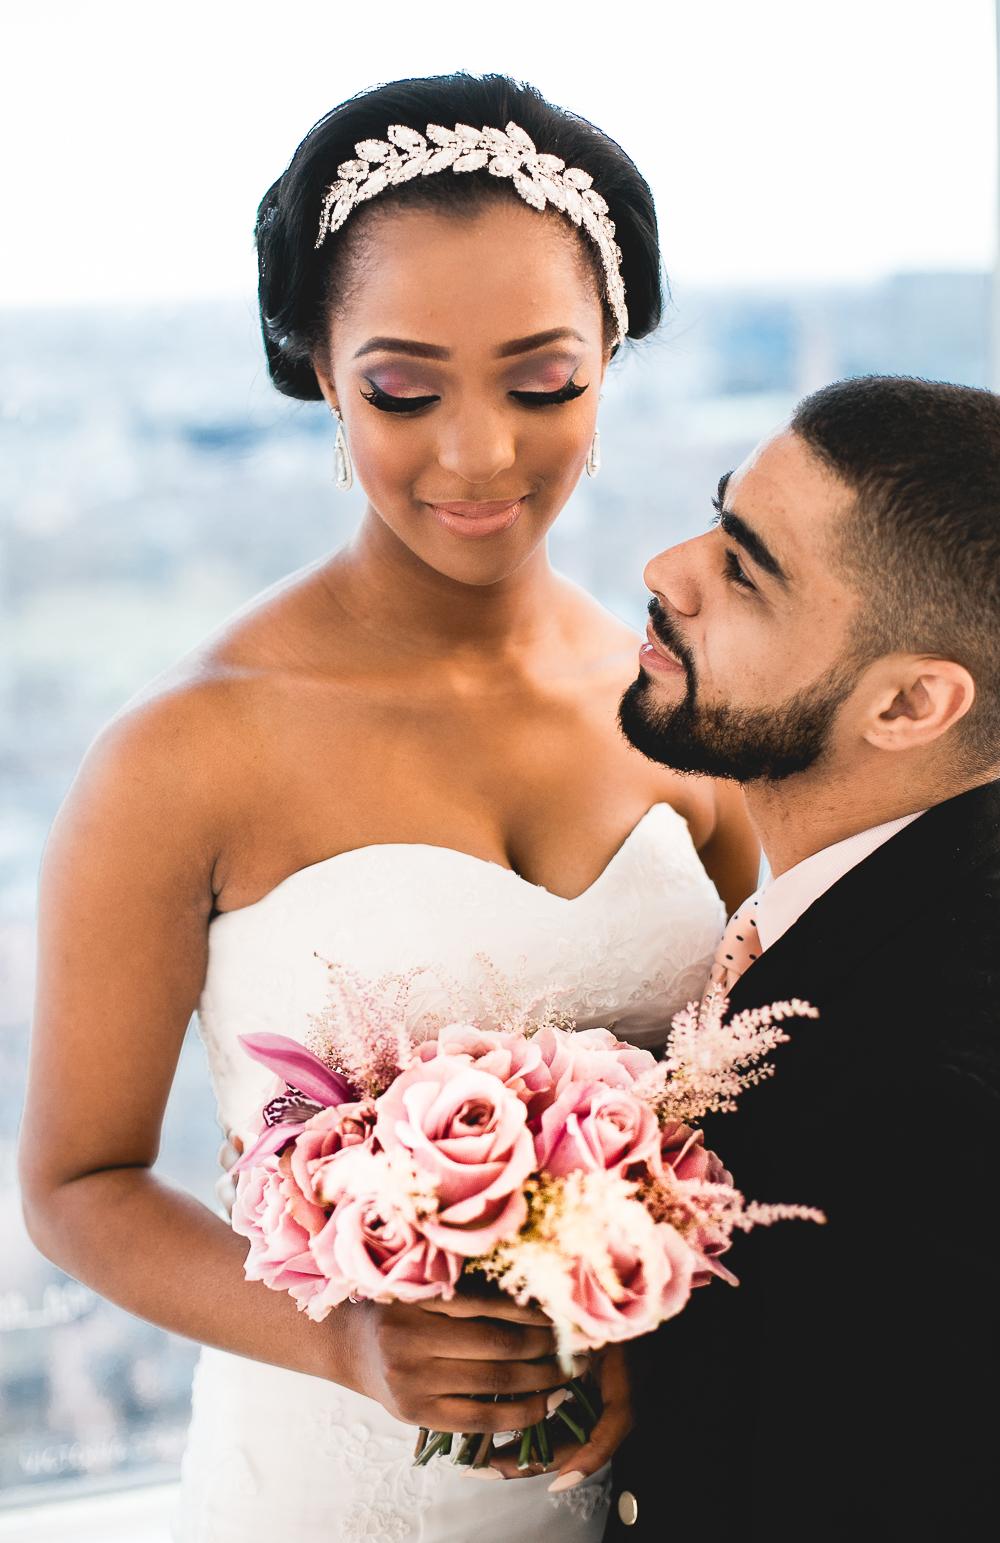 Wedding Photography at Altitude 360 London - Beatrici Photography-47.jpg